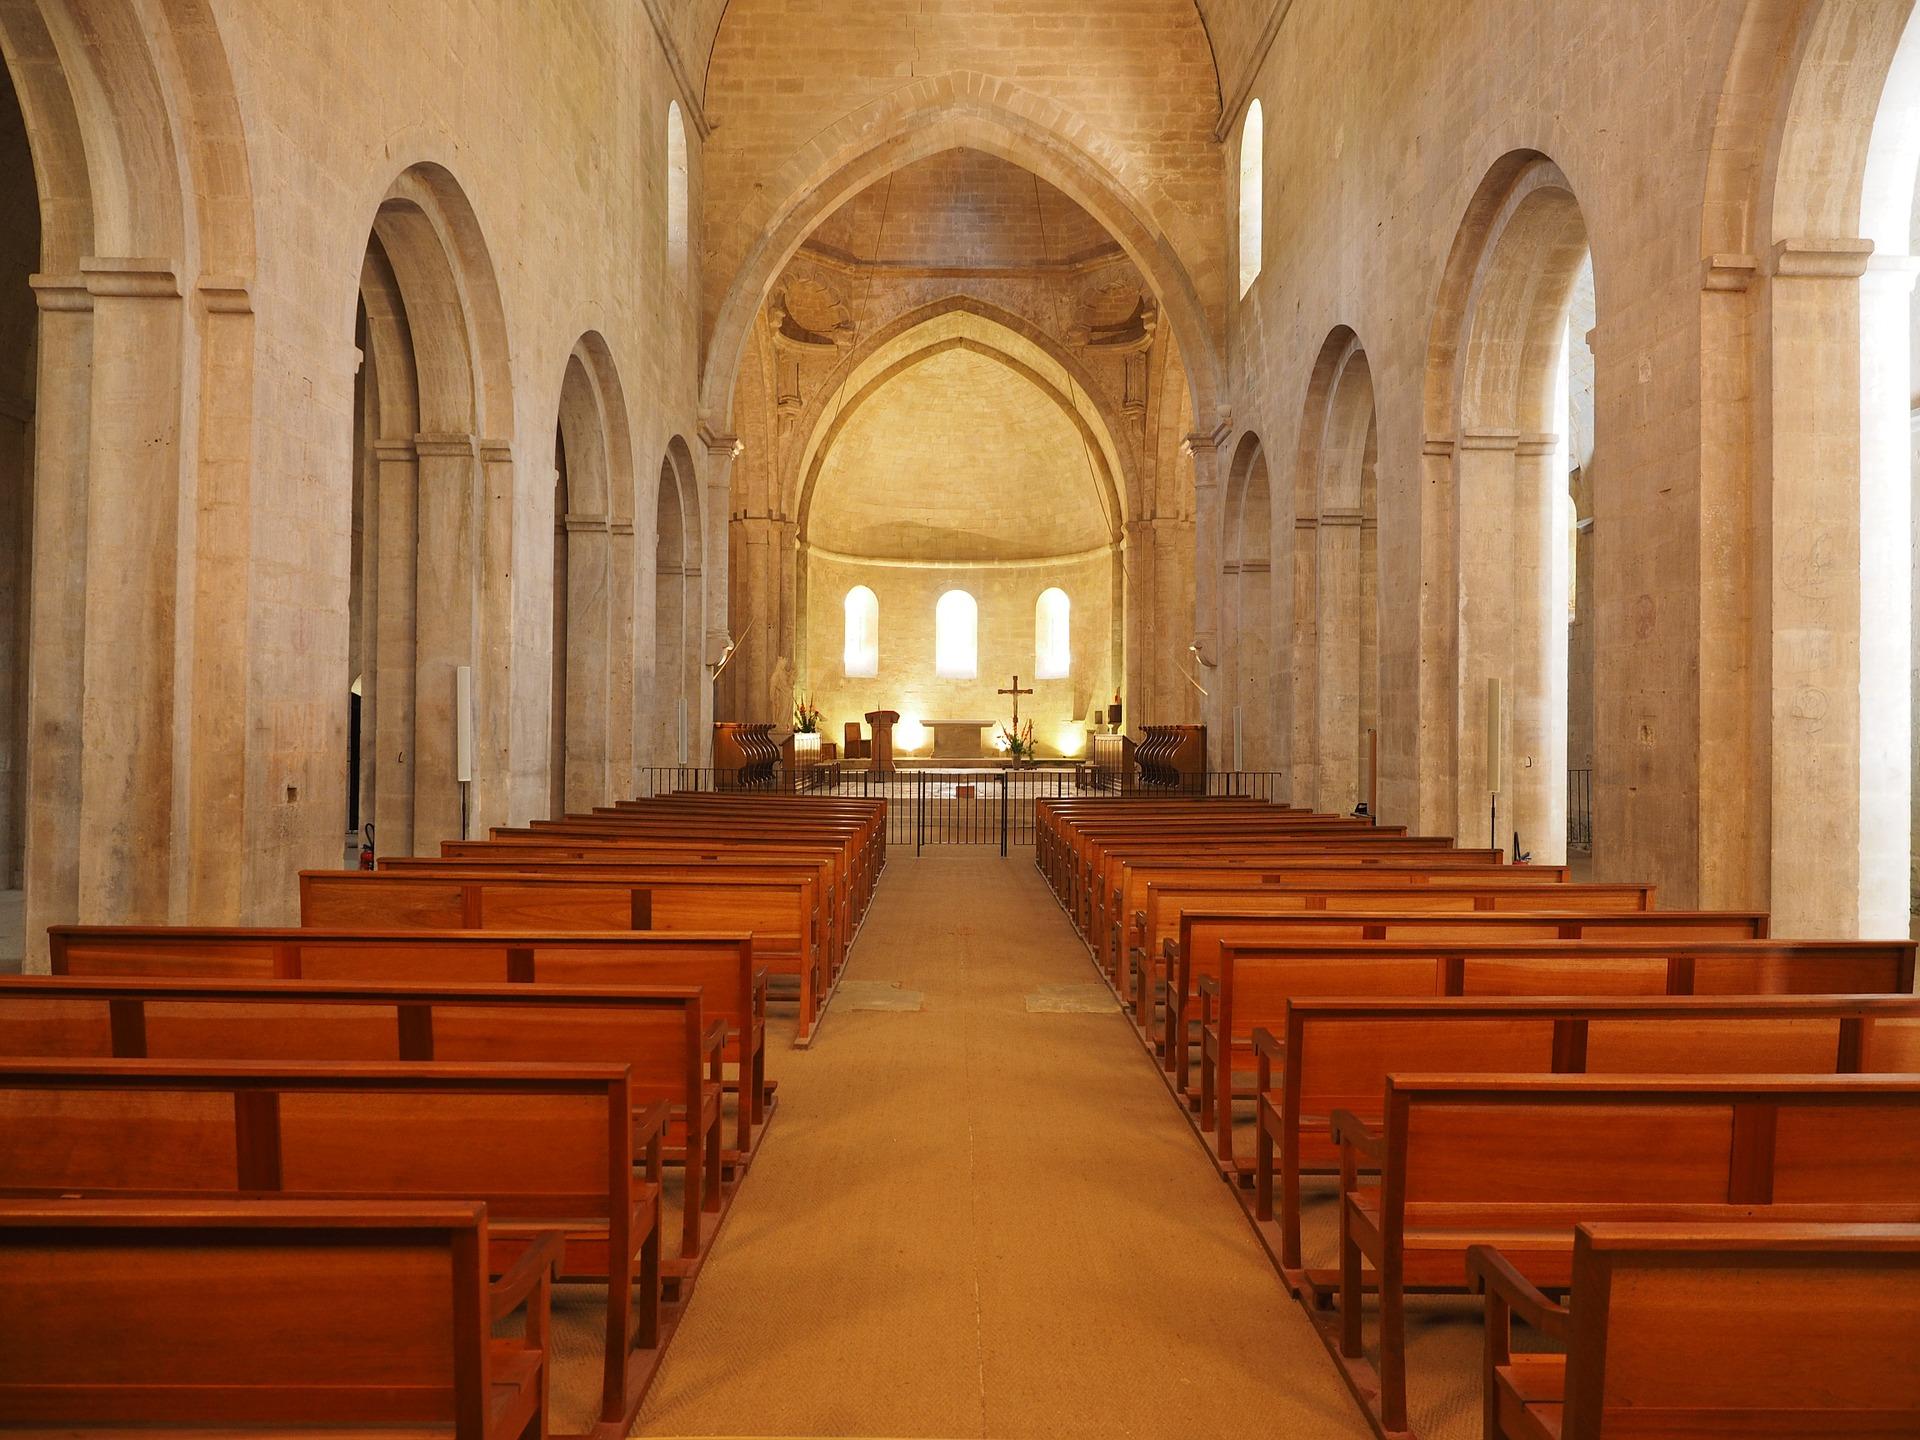 abbey-church-1460368_1920